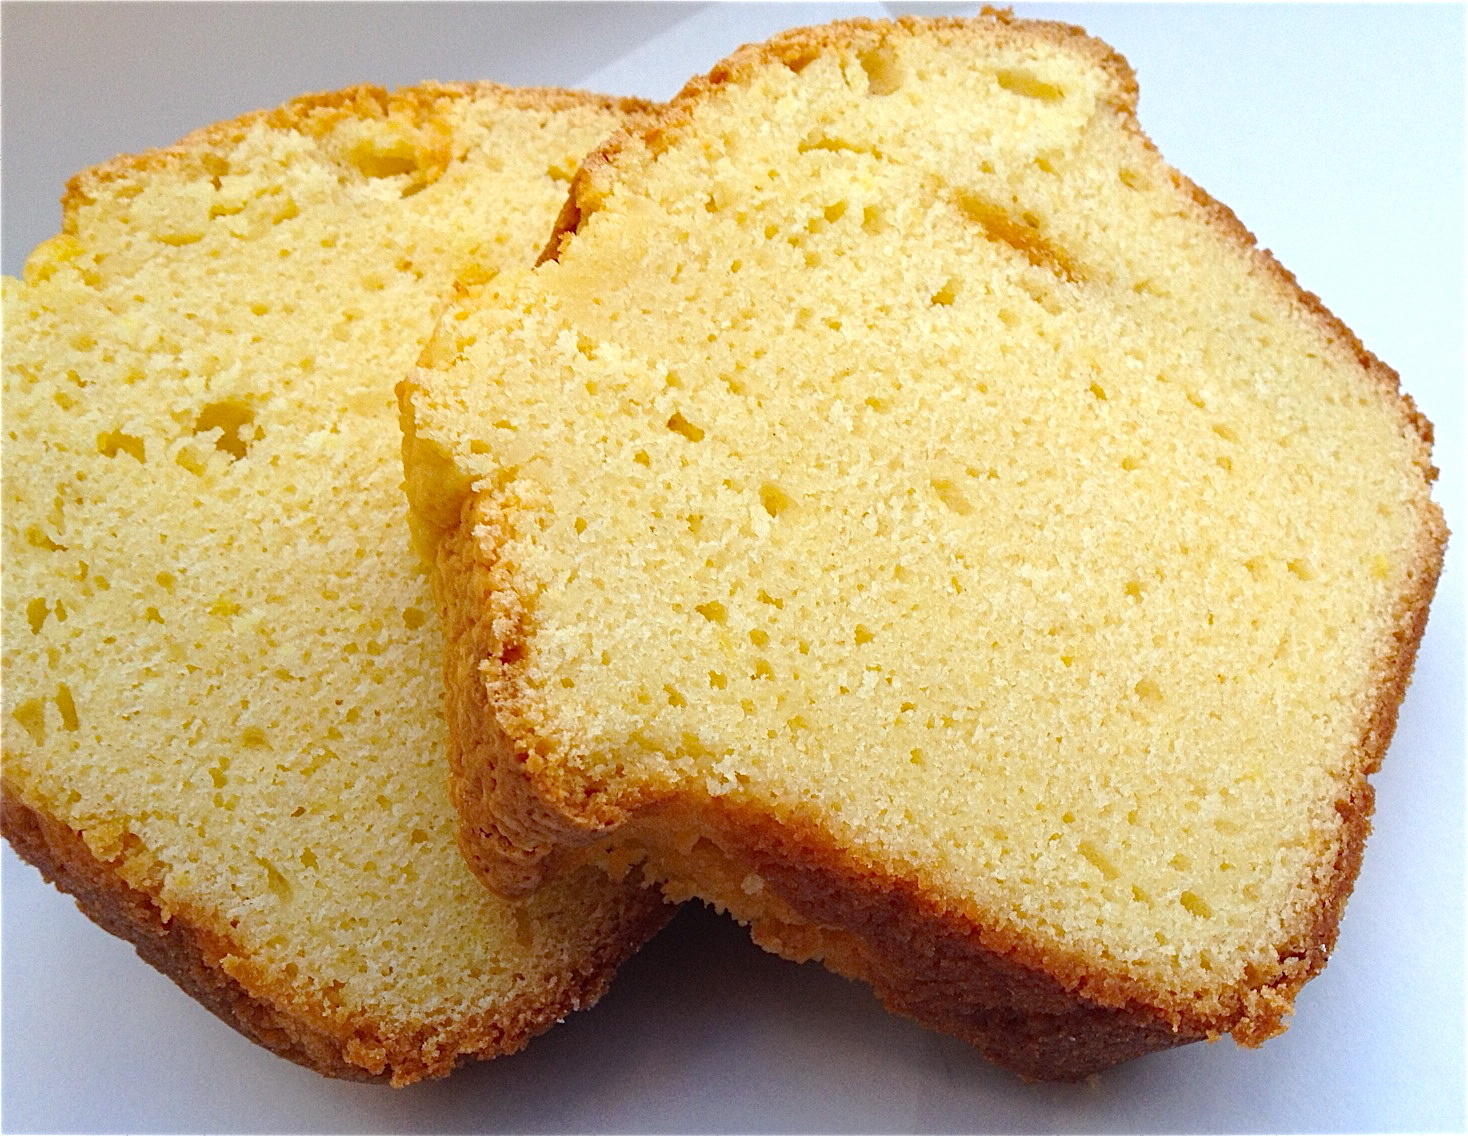 Sour Cream Pound Cake With Lemon Icing